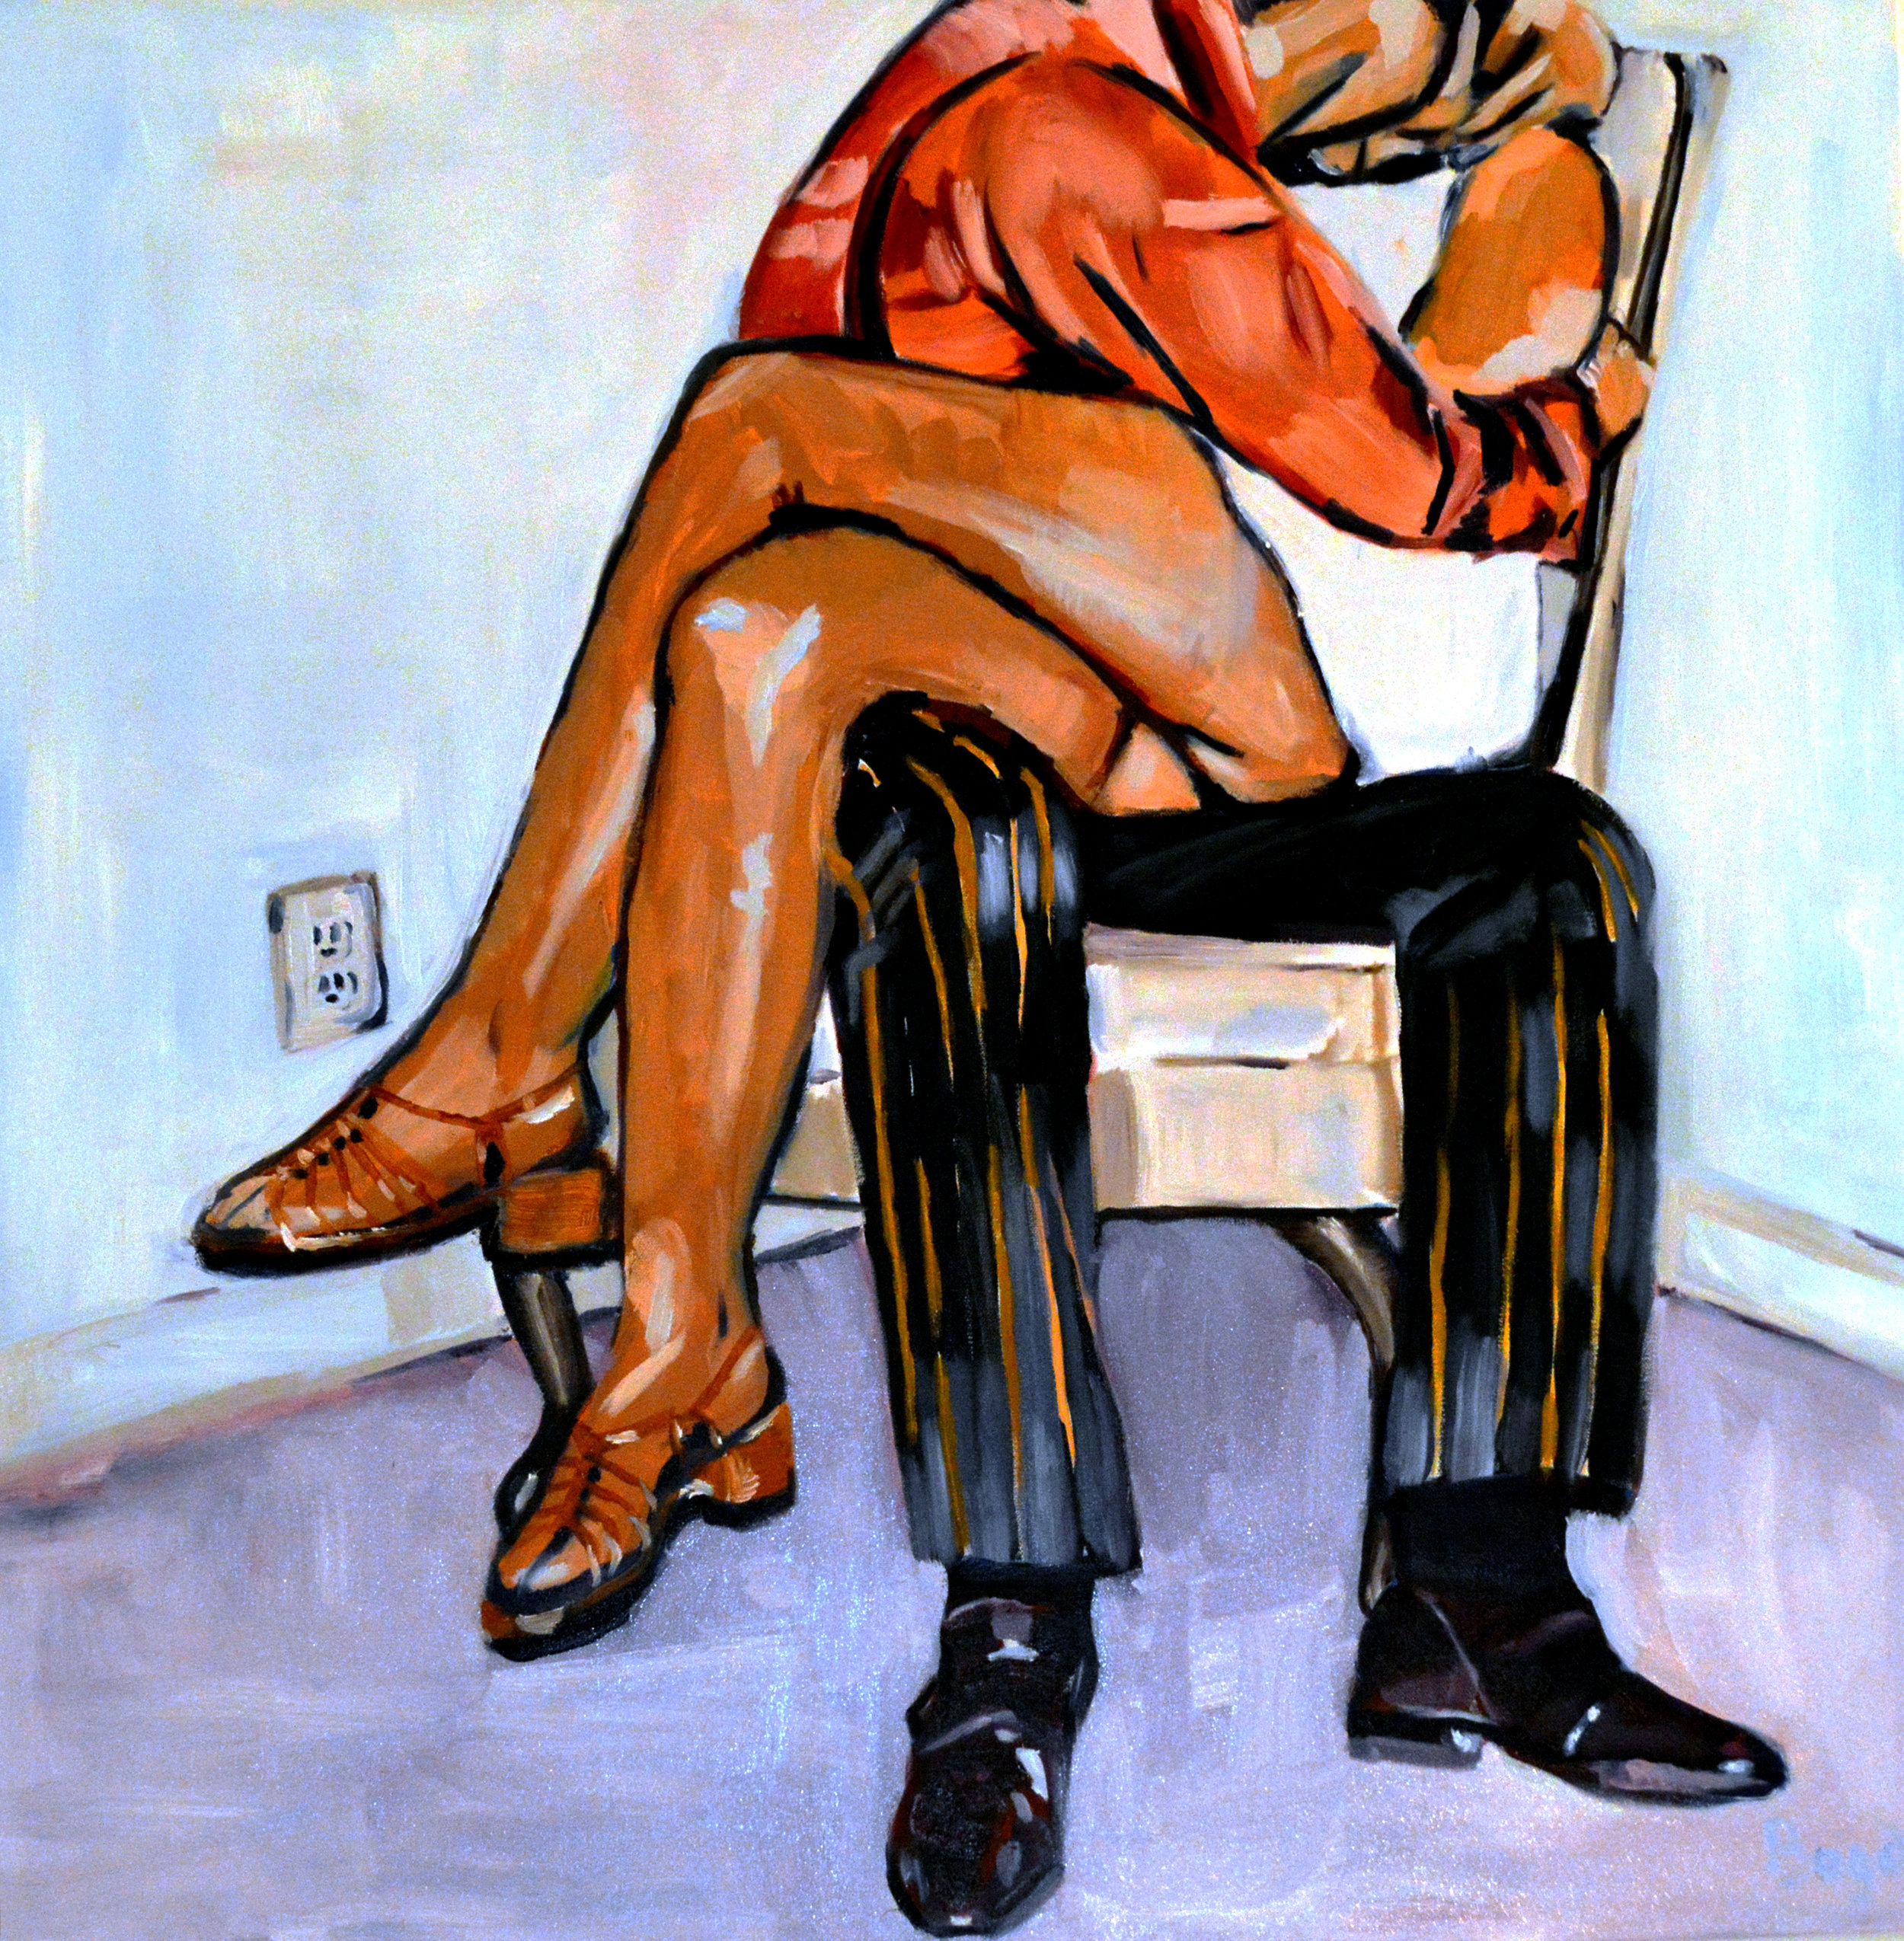 The Kiss - 36X36 Oil on Canvas$1200